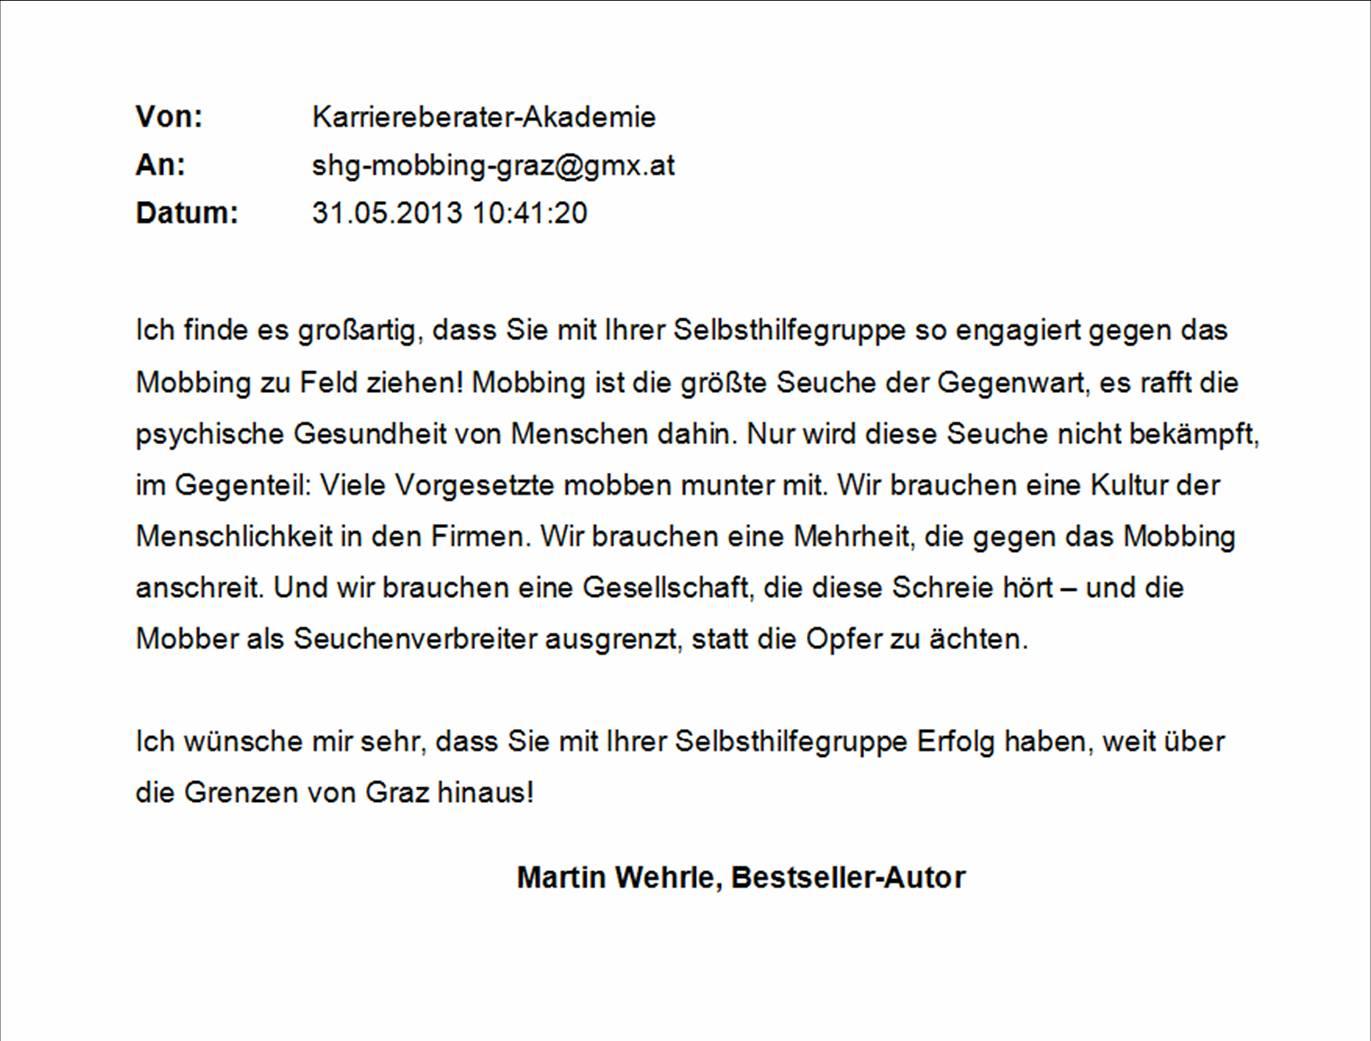 Beste Karriereberatung Monster Lebenslauf Tipps Galerie - Entry ...